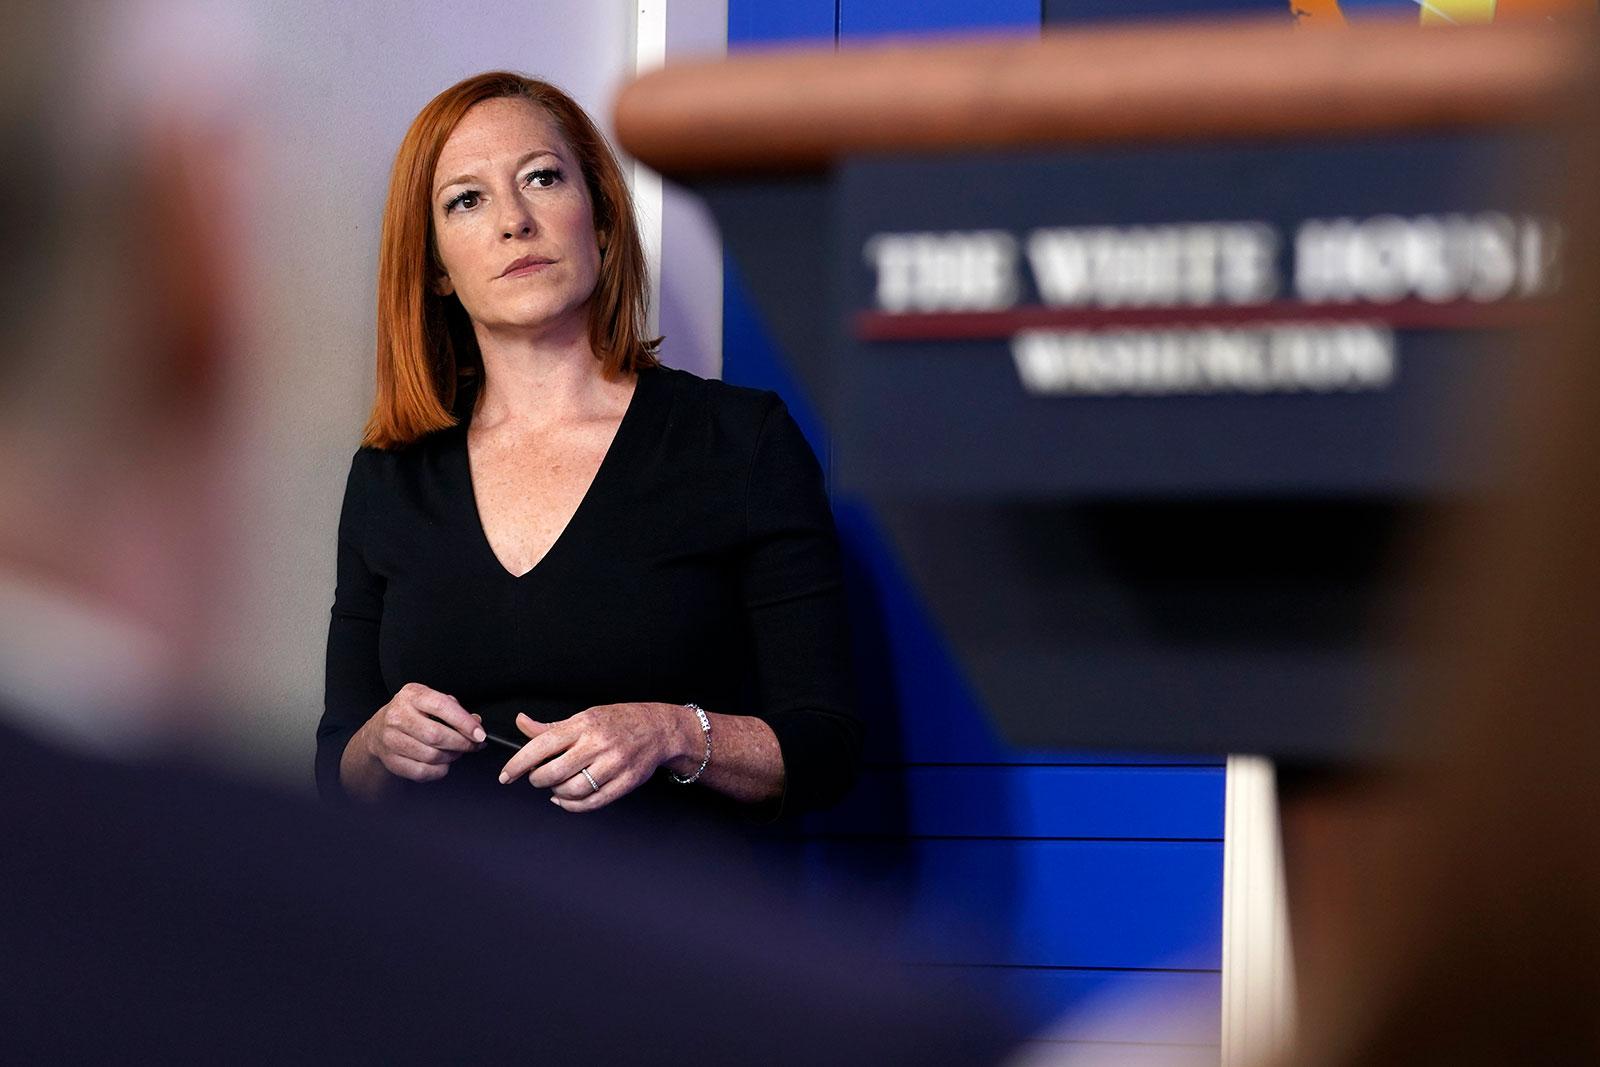 White House press secretary Jen Psaki looks on during a press briefing on June 30.